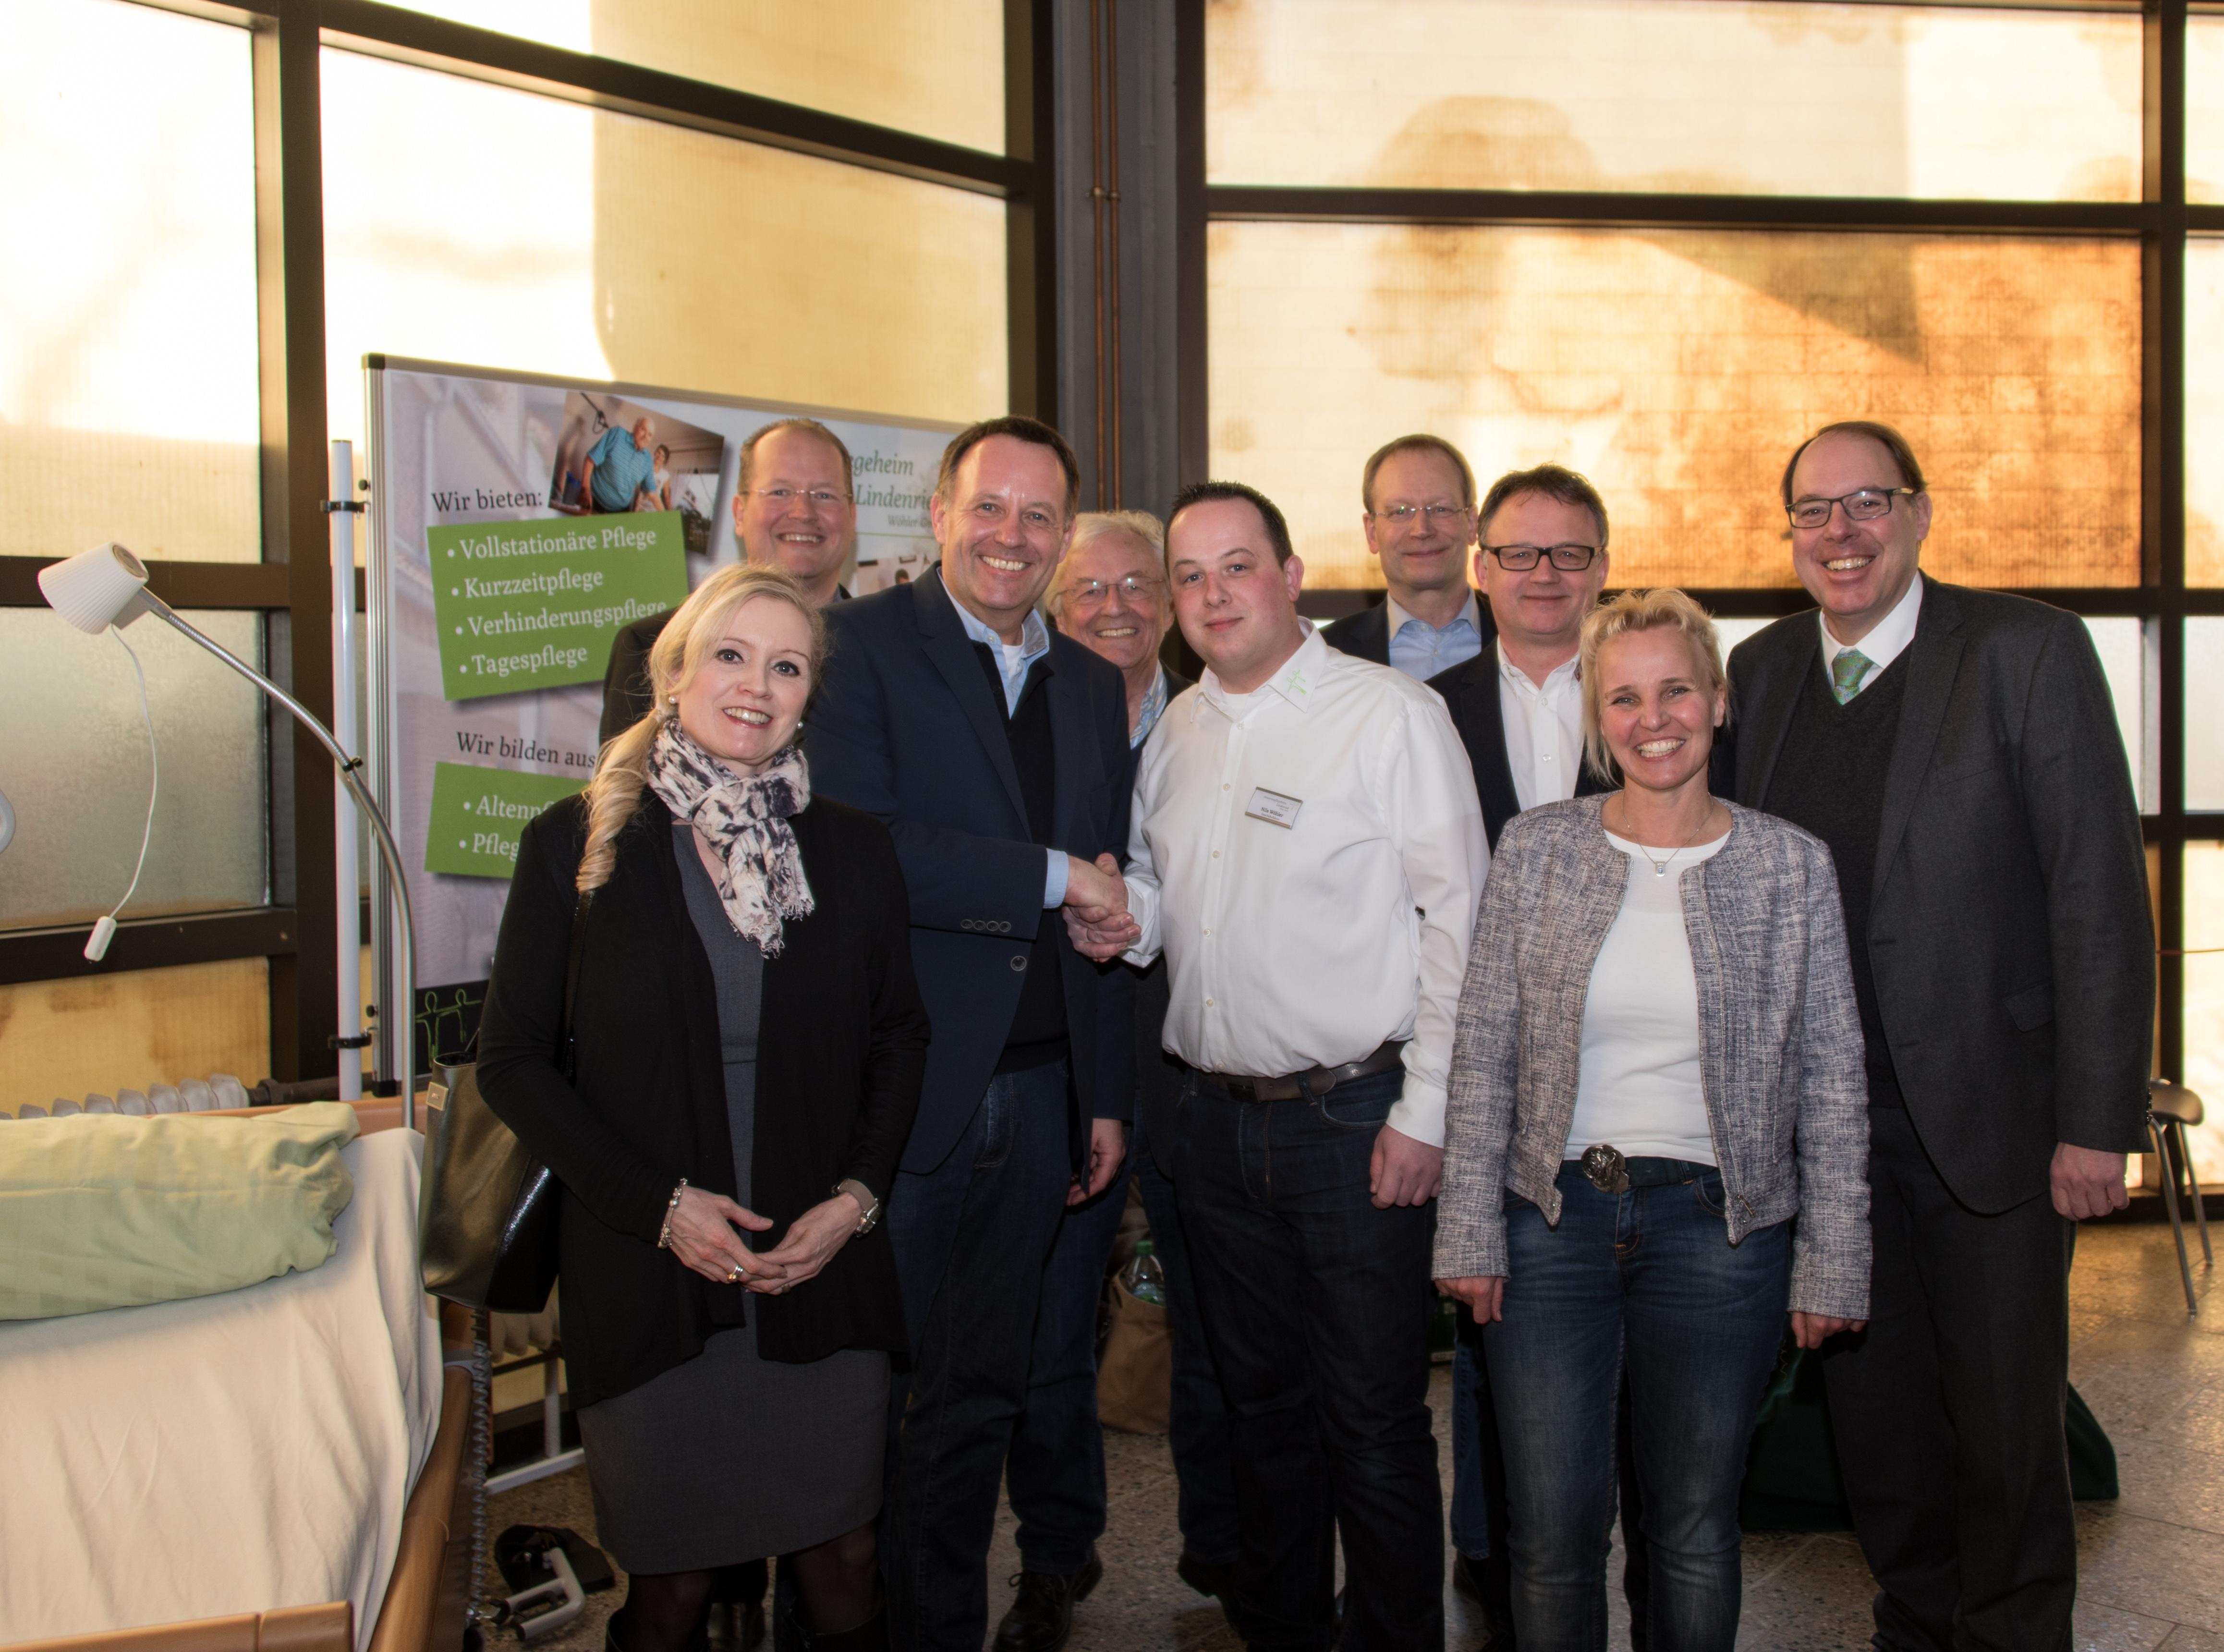 v.l. Sabine Breuckmann, Marc Sinner, Dirk Breuckmann, Rolf Range, Nils Wöhler, Rolf Fortmüller, Frank Leibelt, Bianca Rosenhagen, Gregor Schneider